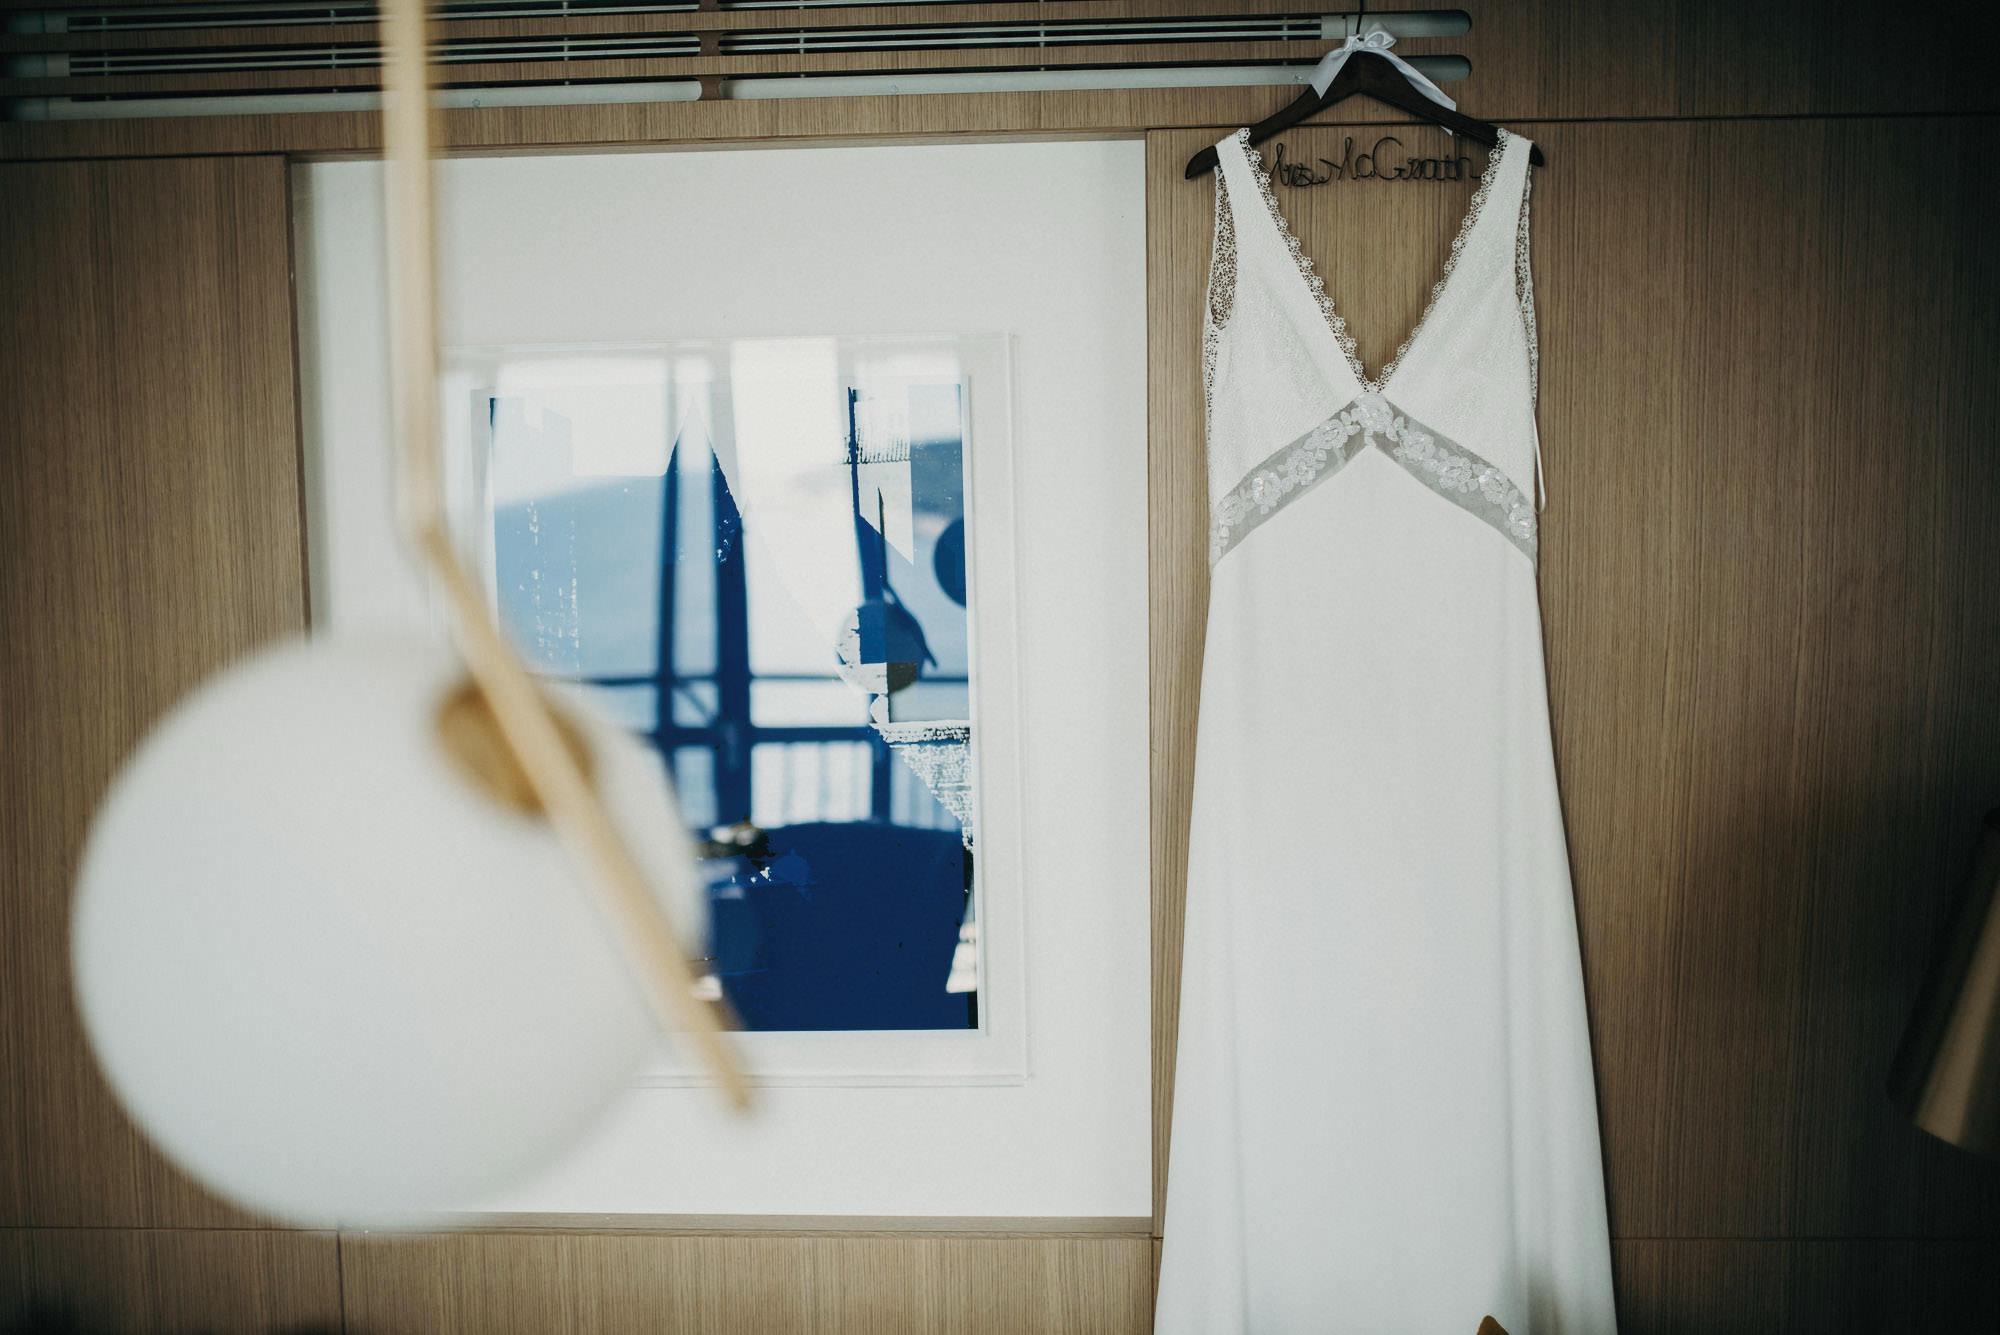 dubrovnik_croatia_wedding_photographer-jere_satamo-destination_weddings-032-web.jpg